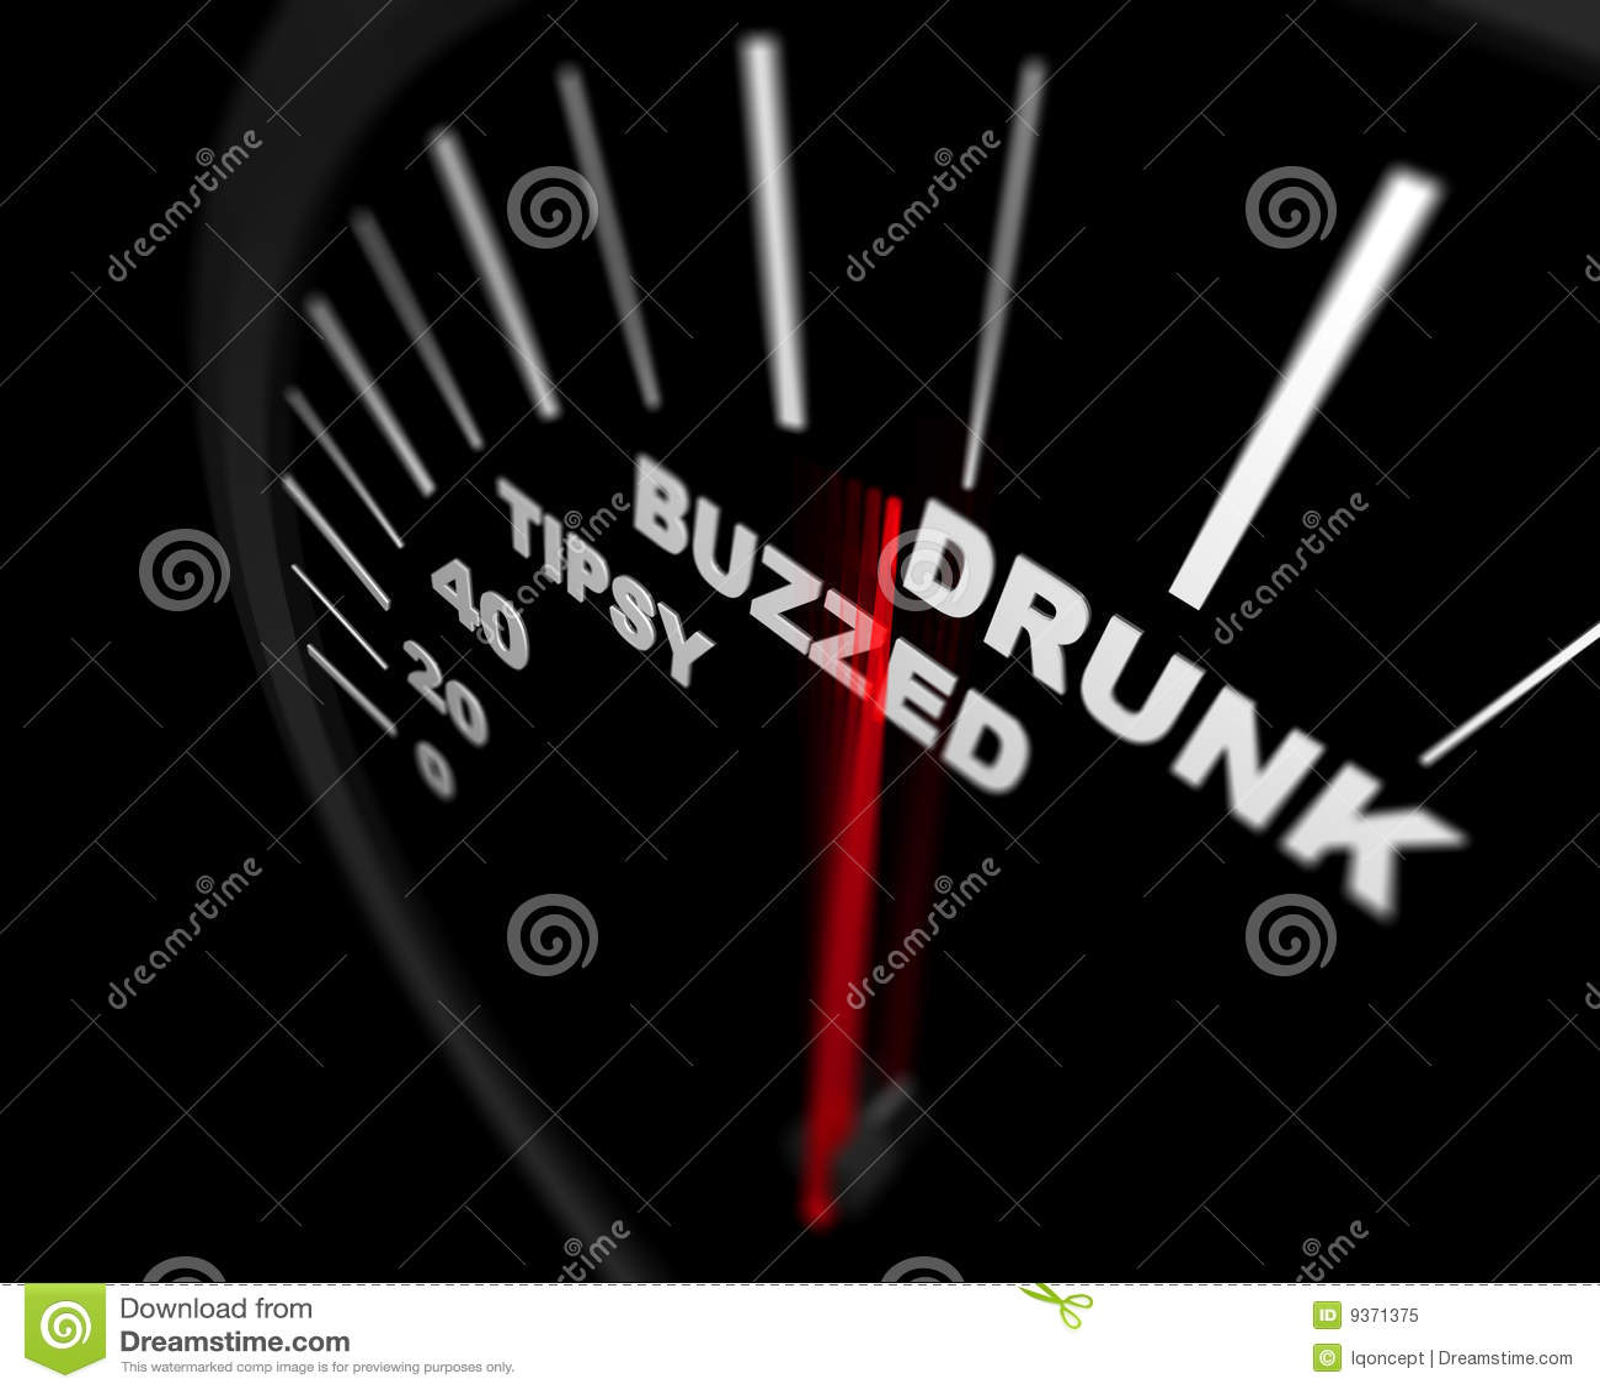 Плакаты и рисунки на темунаркомания алкоголизм токсикомания табакокурение